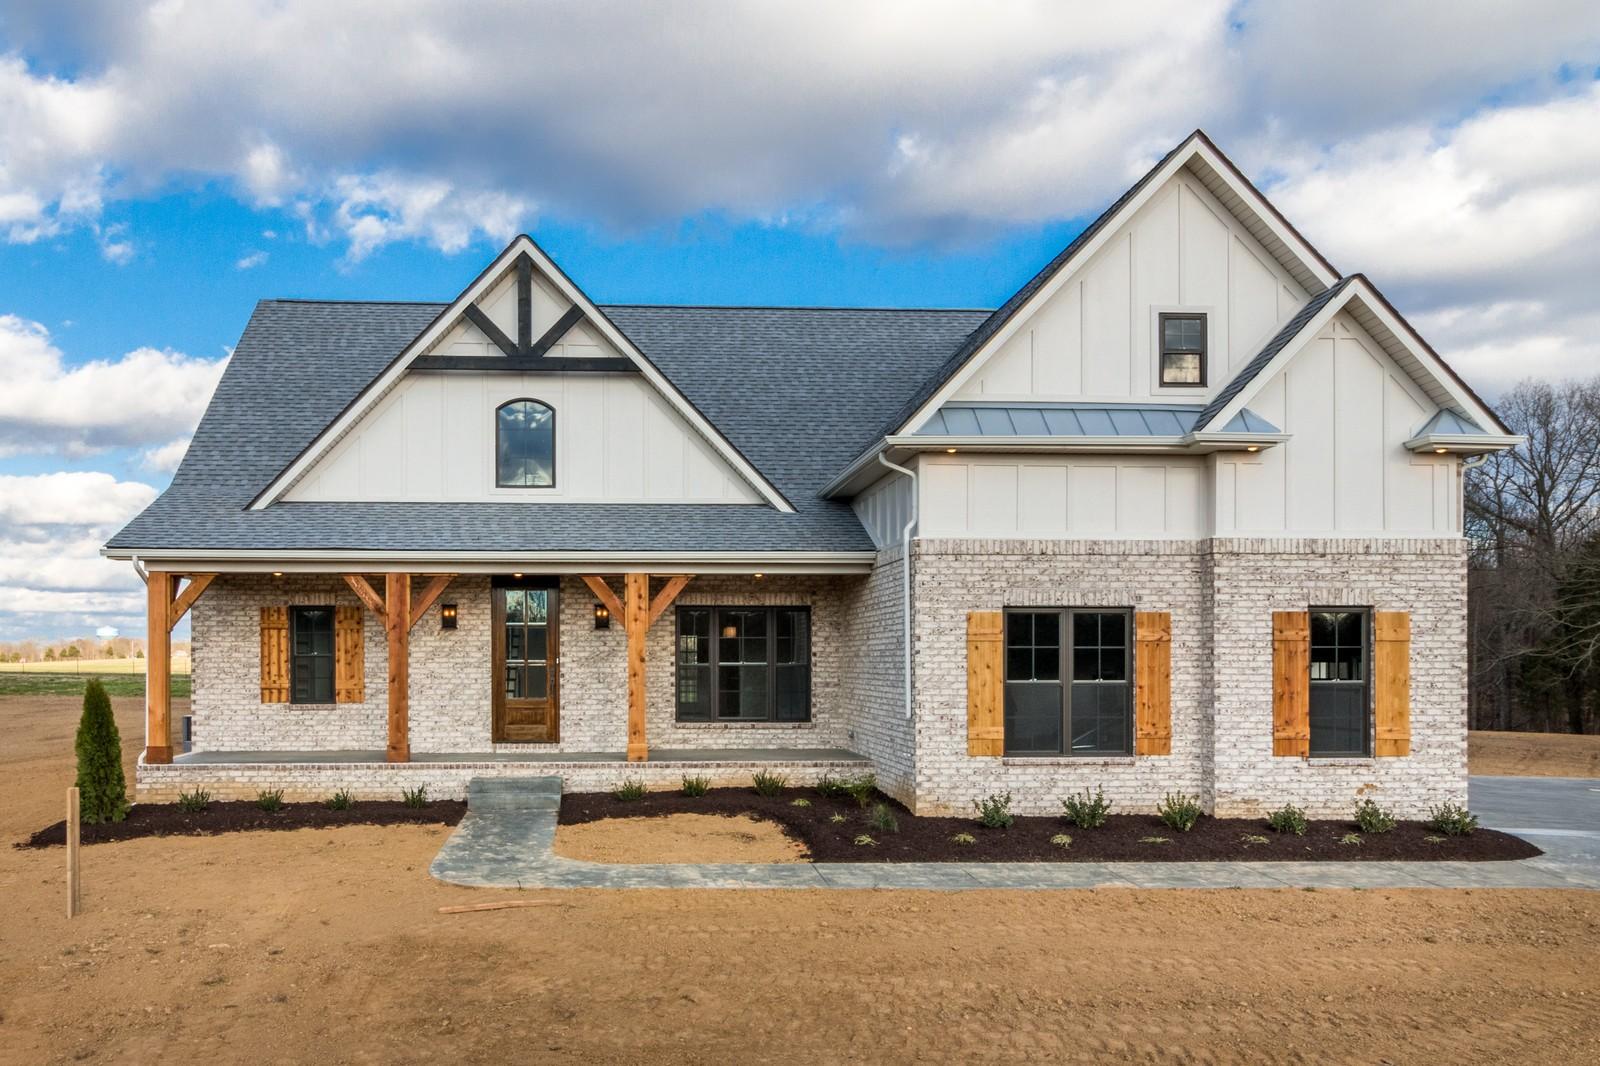 42 Whitewood Farm , Clarksville, TN 37043 - Clarksville, TN real estate listing